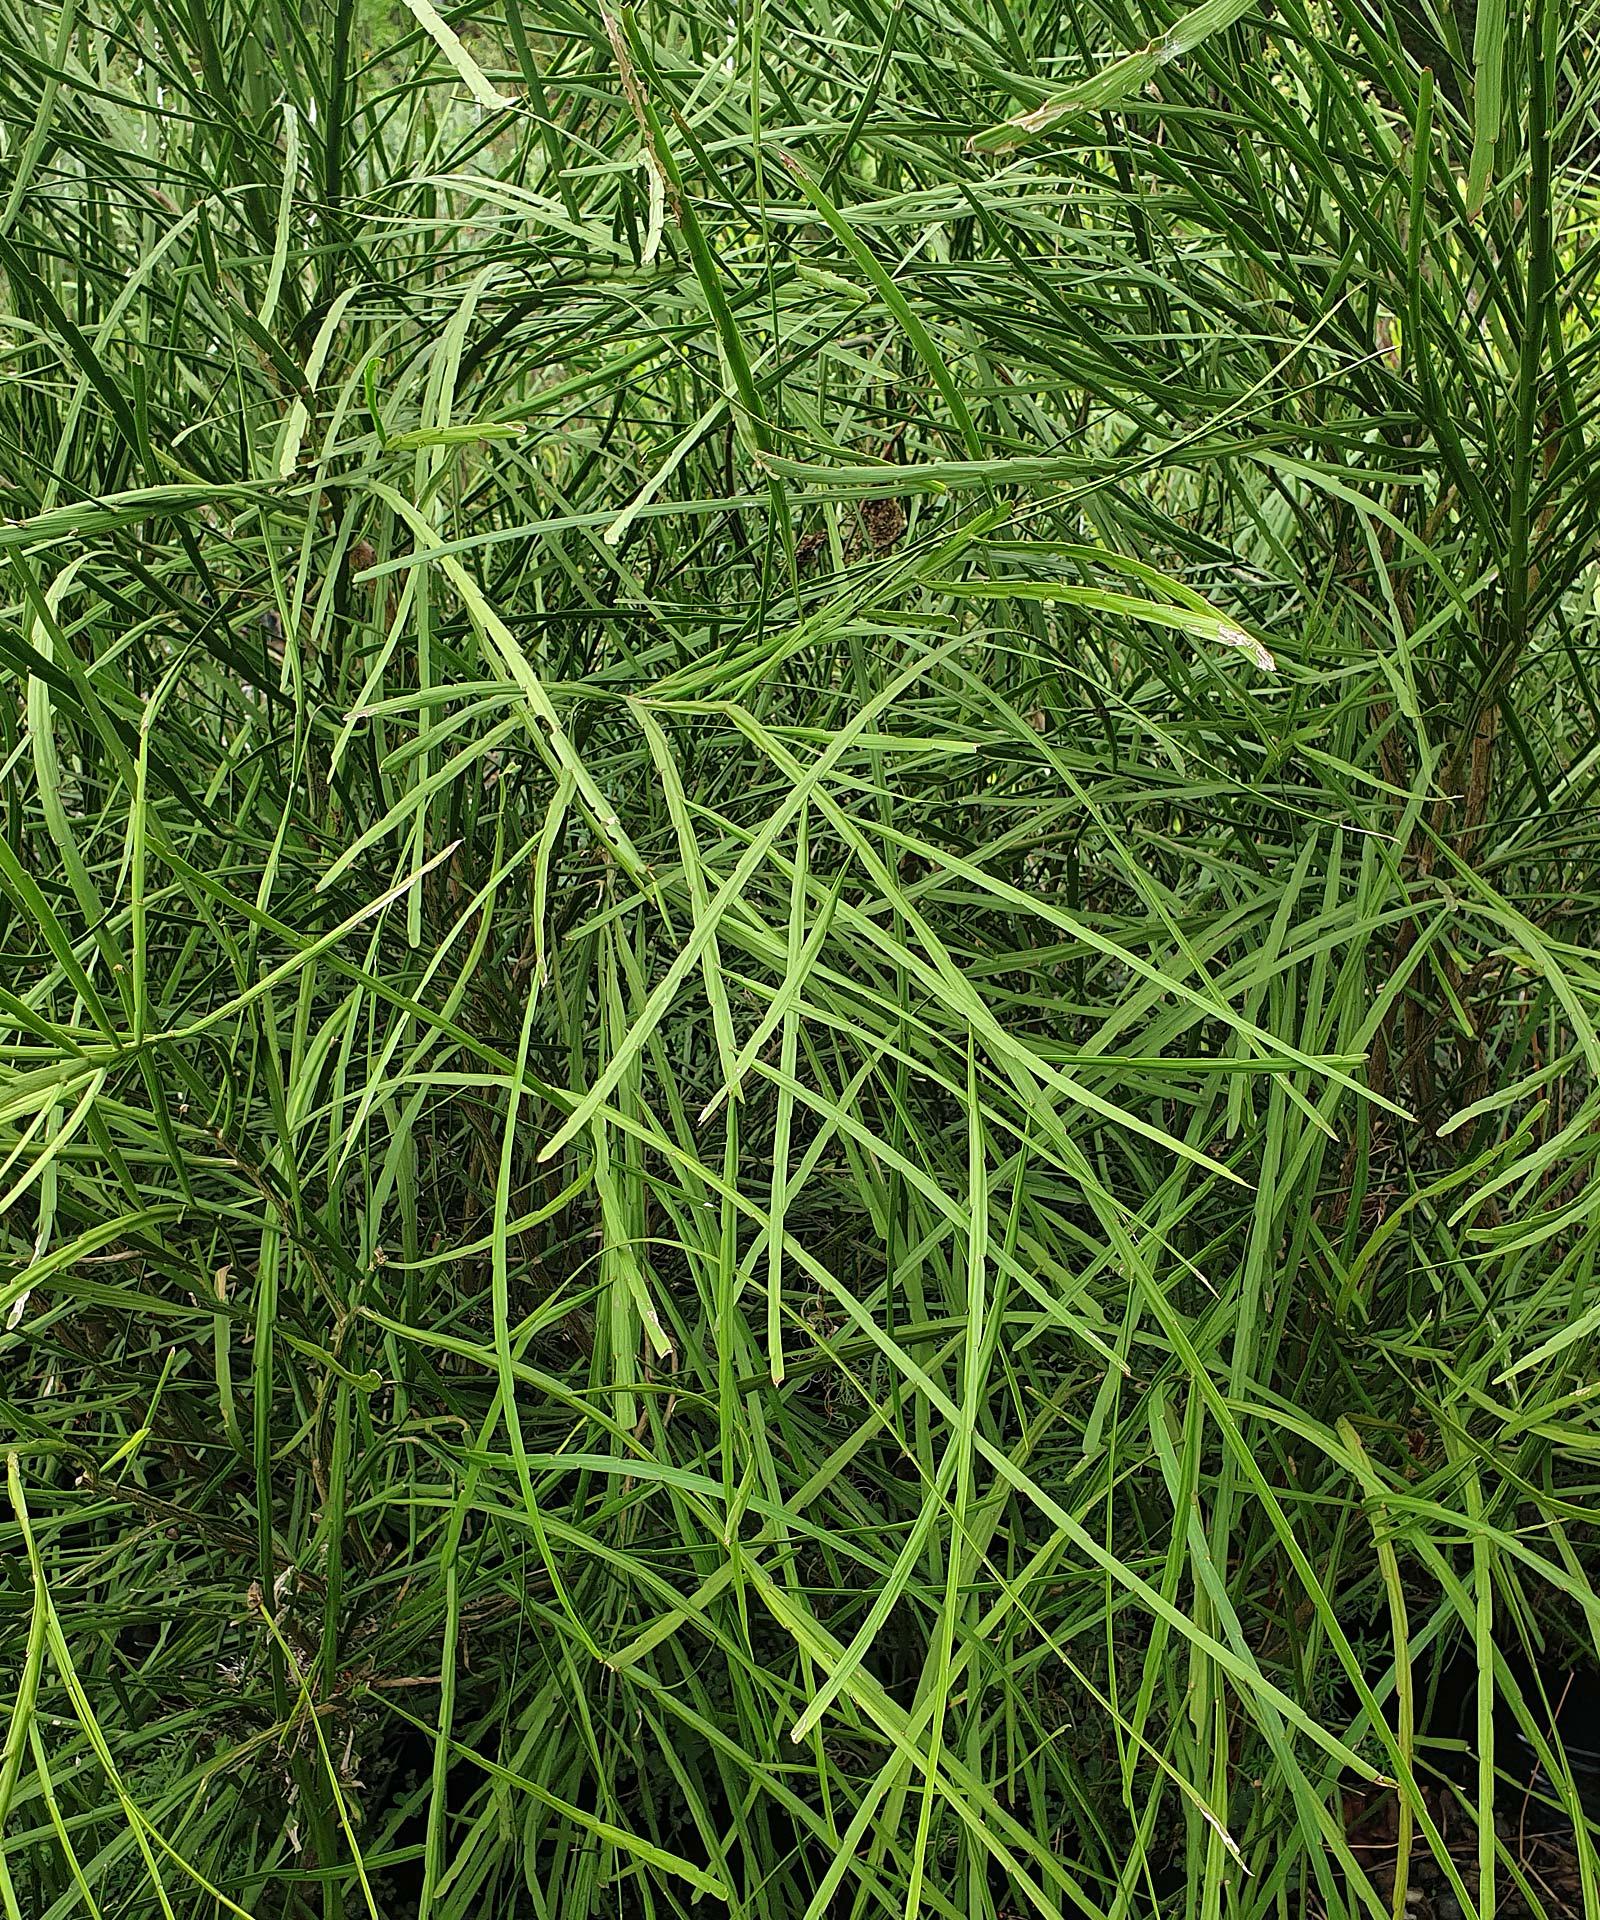 Carmichaelia-australis